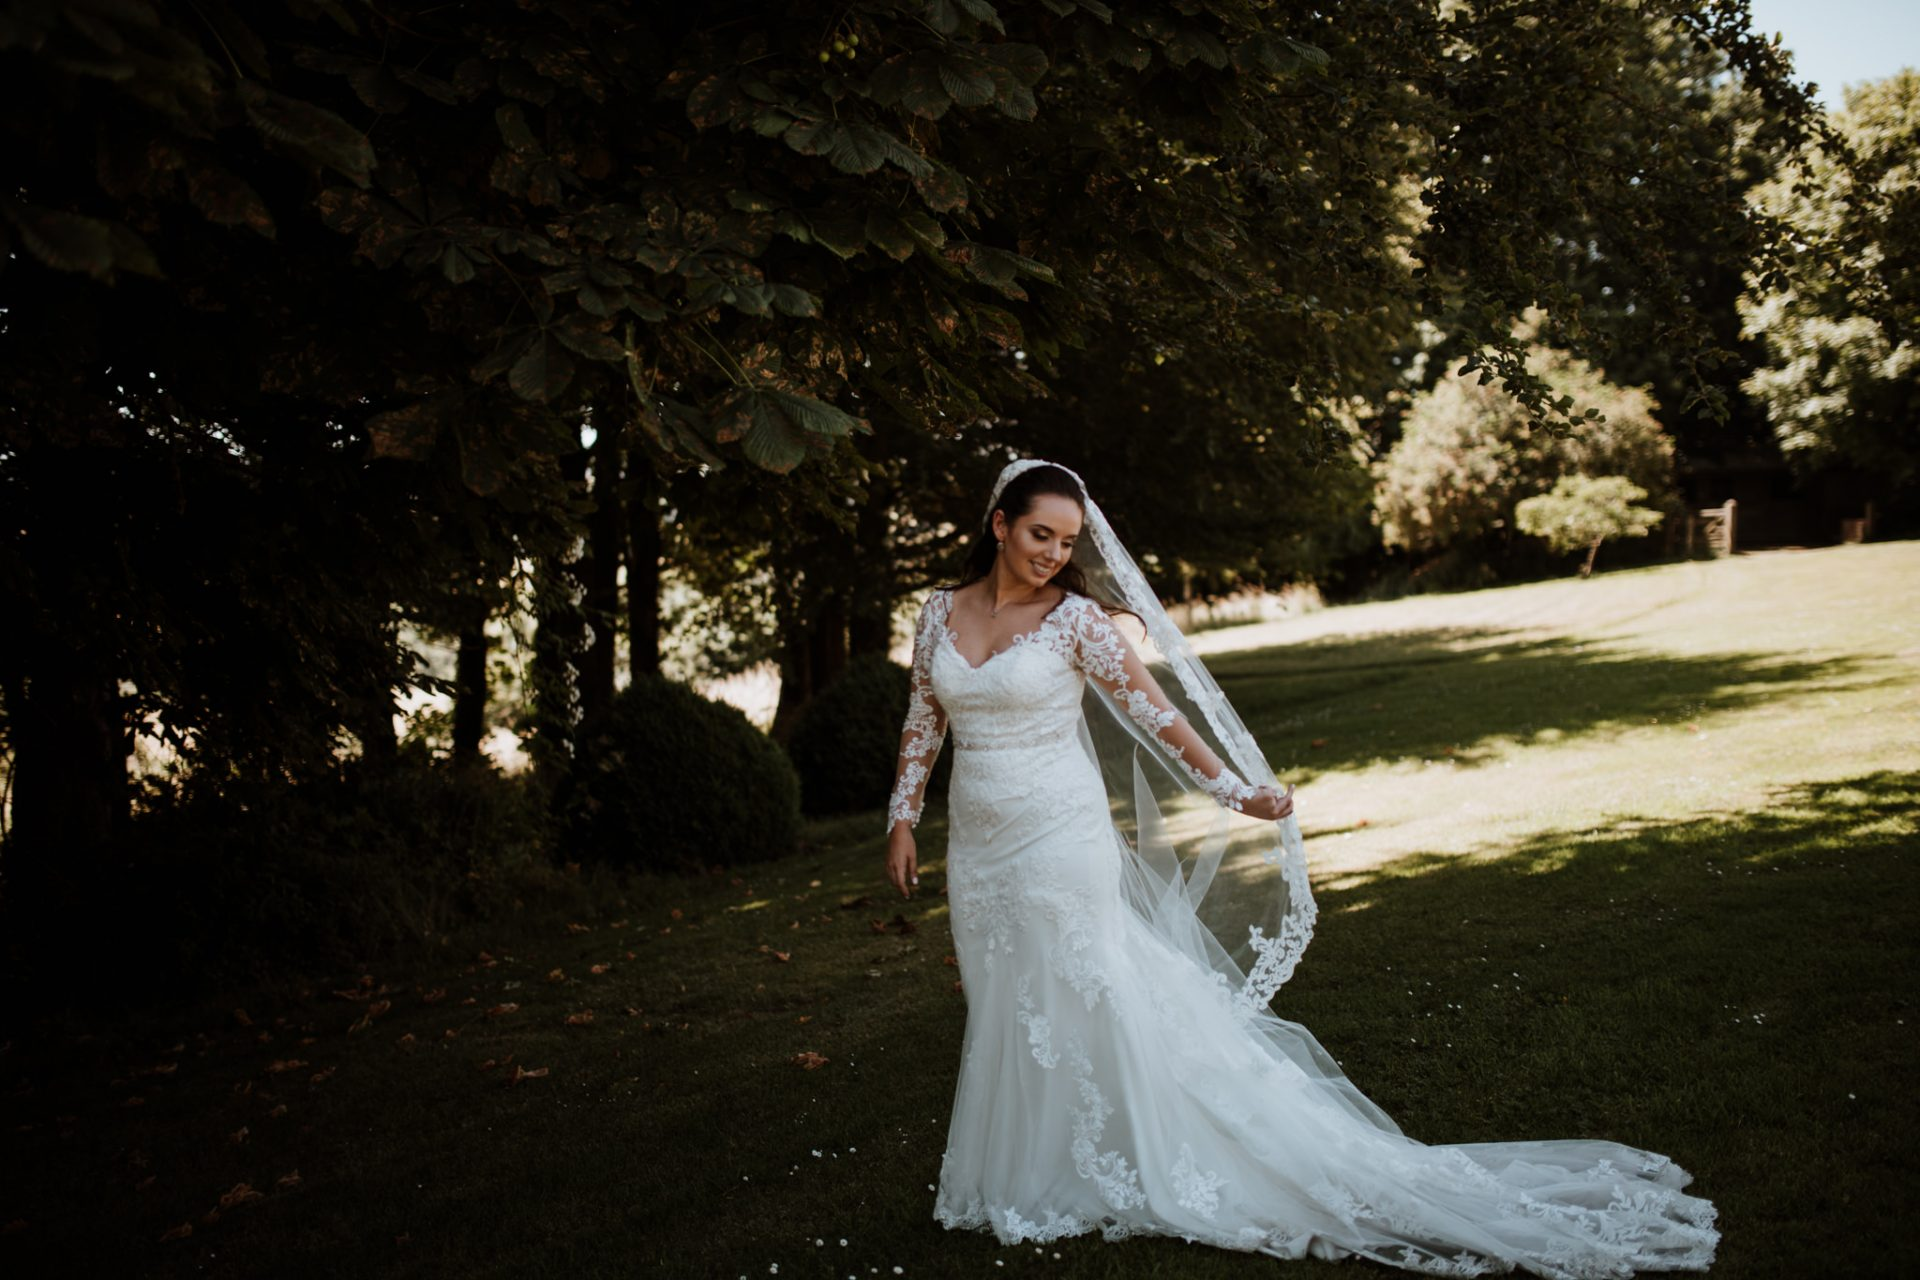 bridal portrait bride swings her veil around